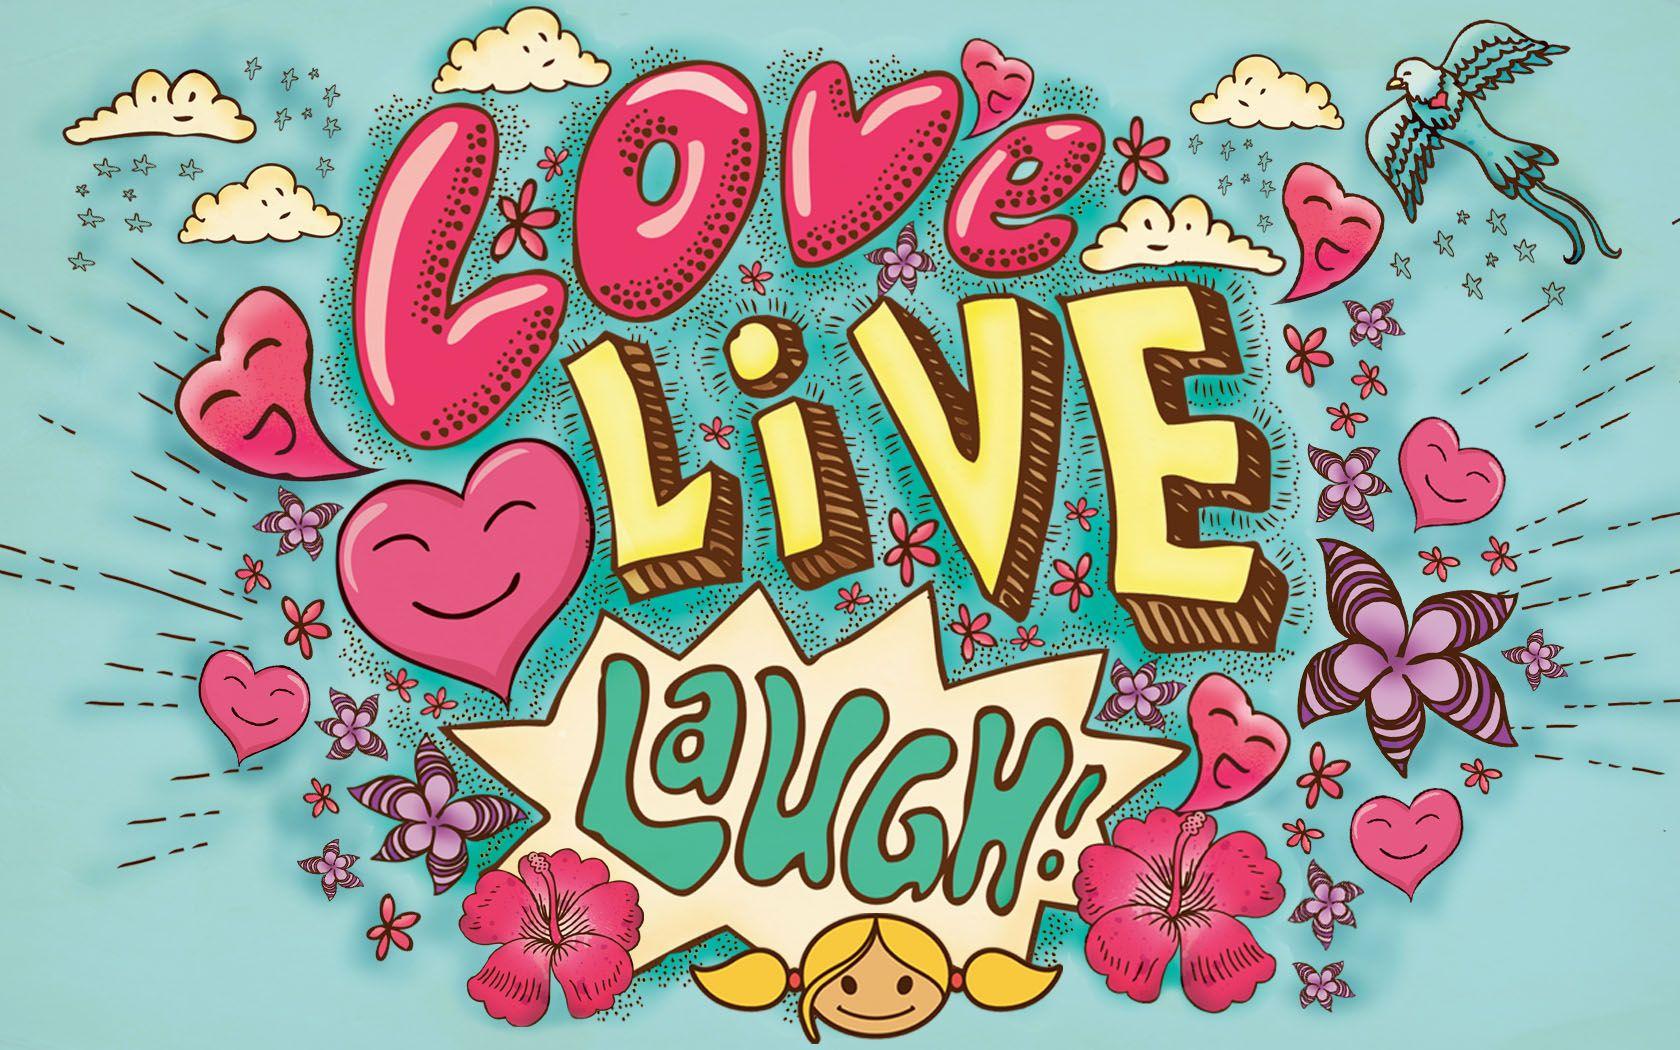 Live Laugh Love Love Wallpaper Download Live Laugh Love Love Wallpaper